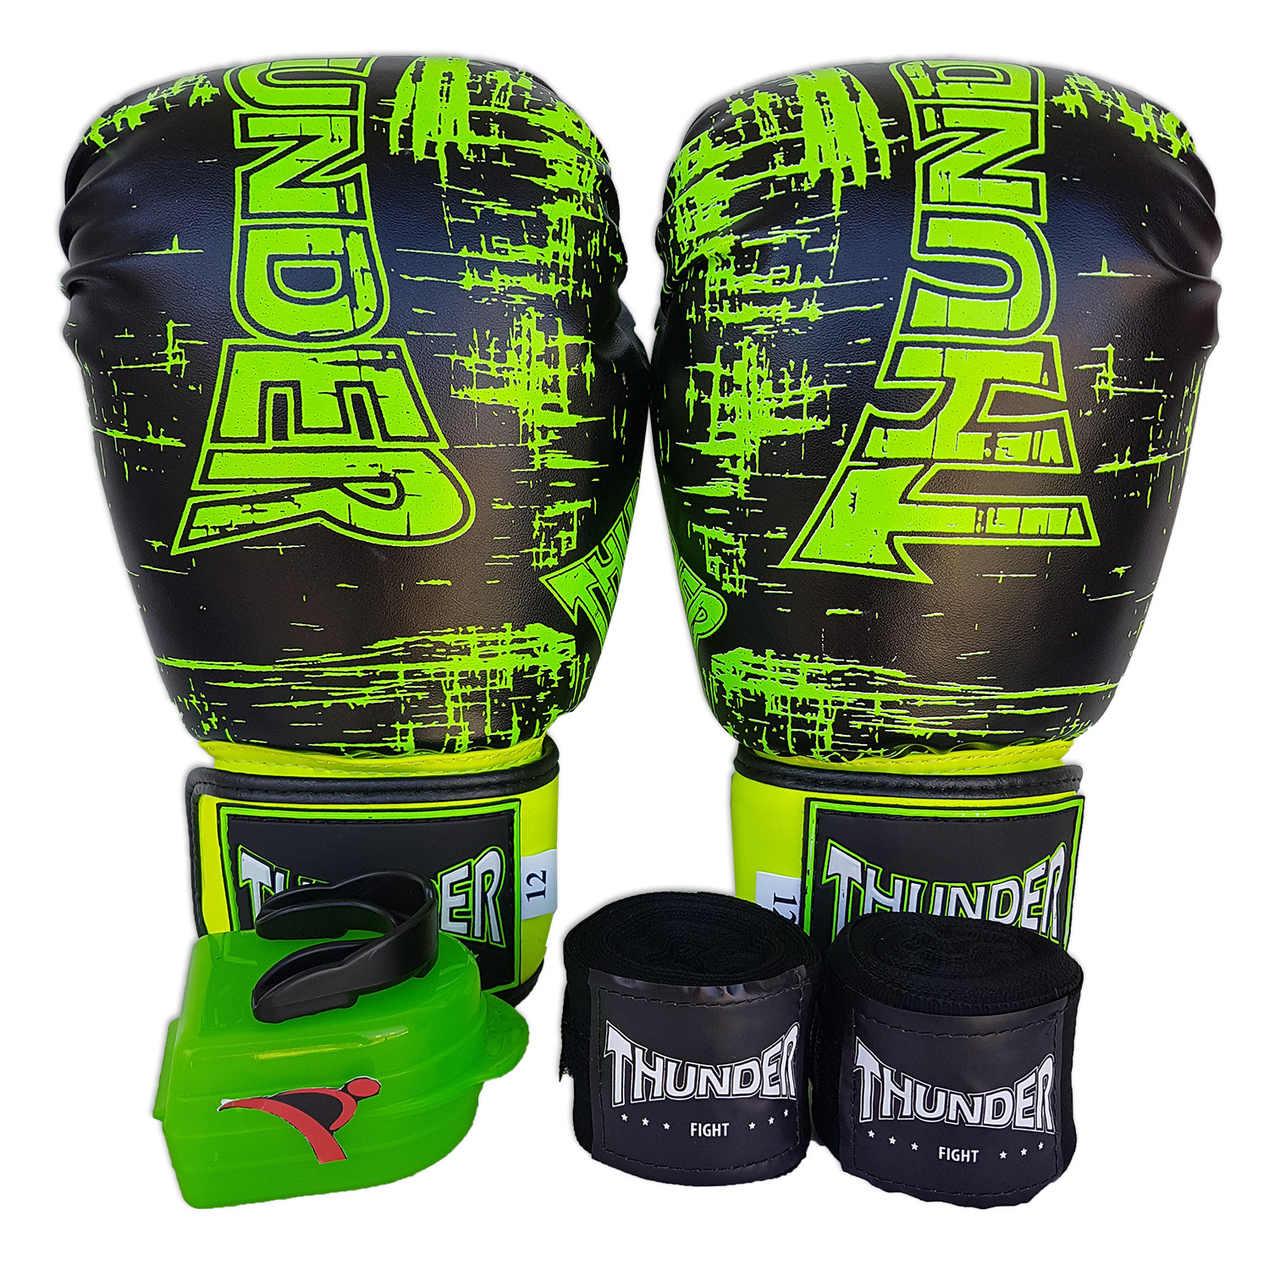 Kit de Boxe / Muay Thai 12oz - Preto Riscado Verde - Thunder Fight   - PRALUTA SHOP